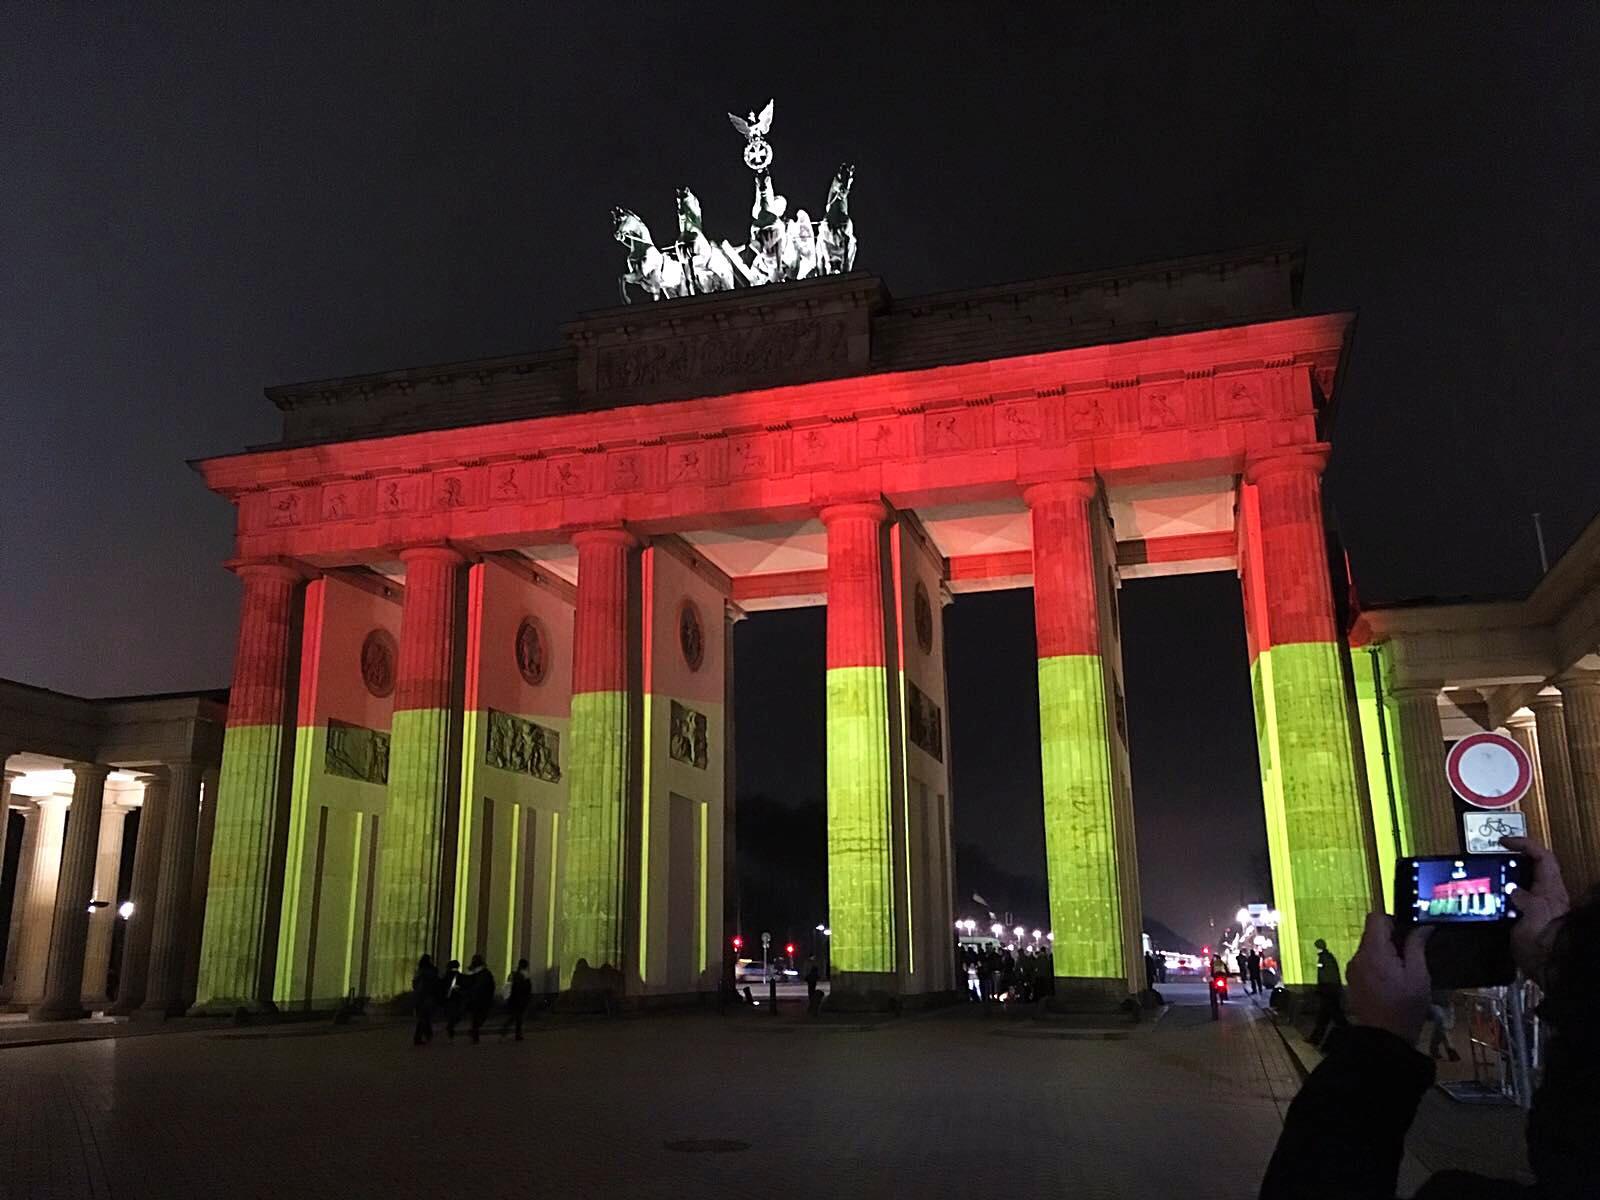 Brandenburg Gate by @visitberlin things must do when visiting Berlin